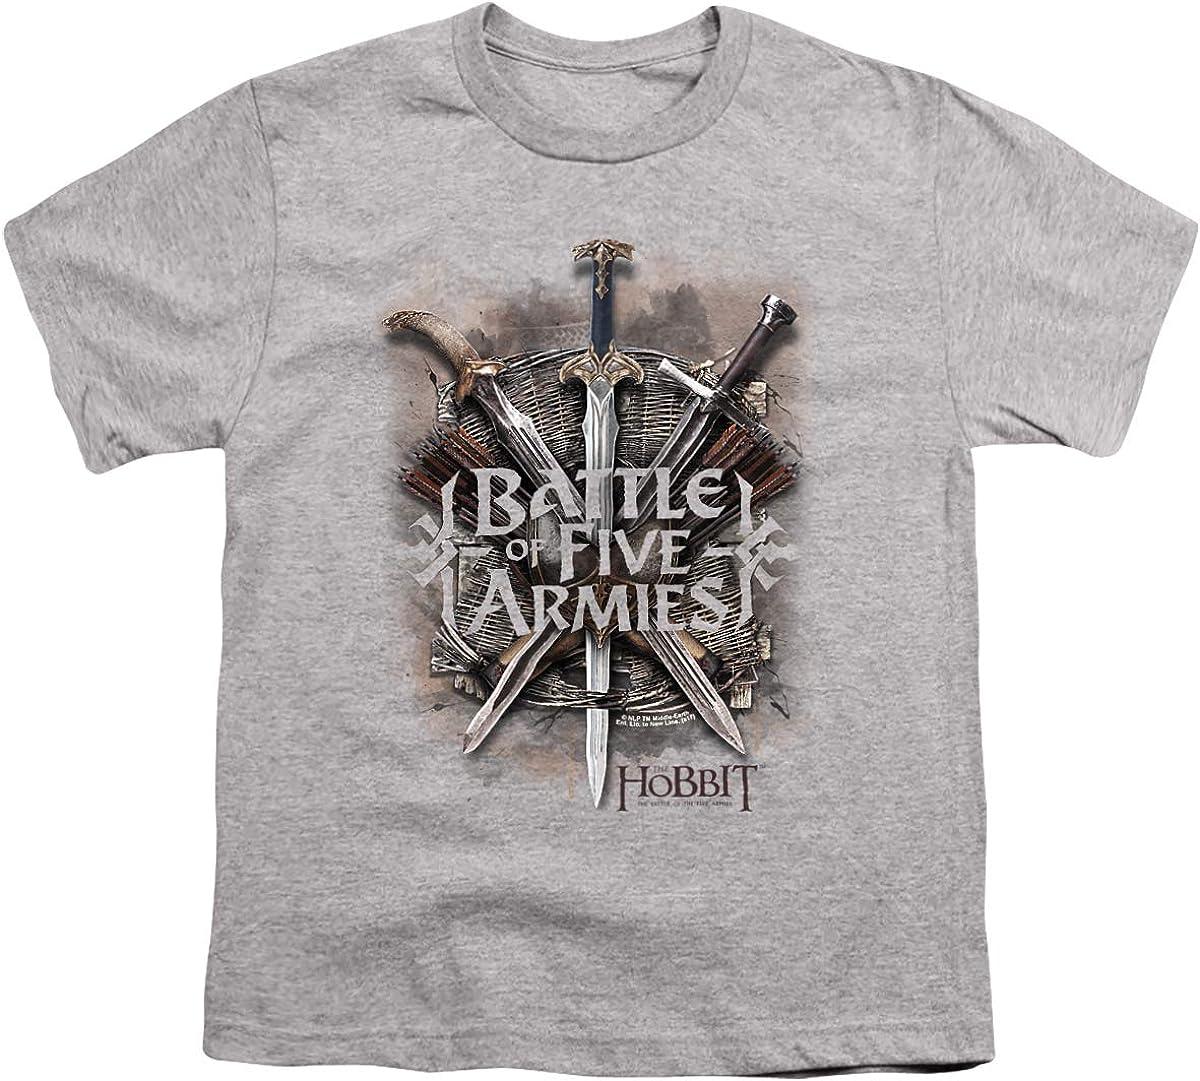 Hobbit Battle of Armies Unisex Youth T Shirt